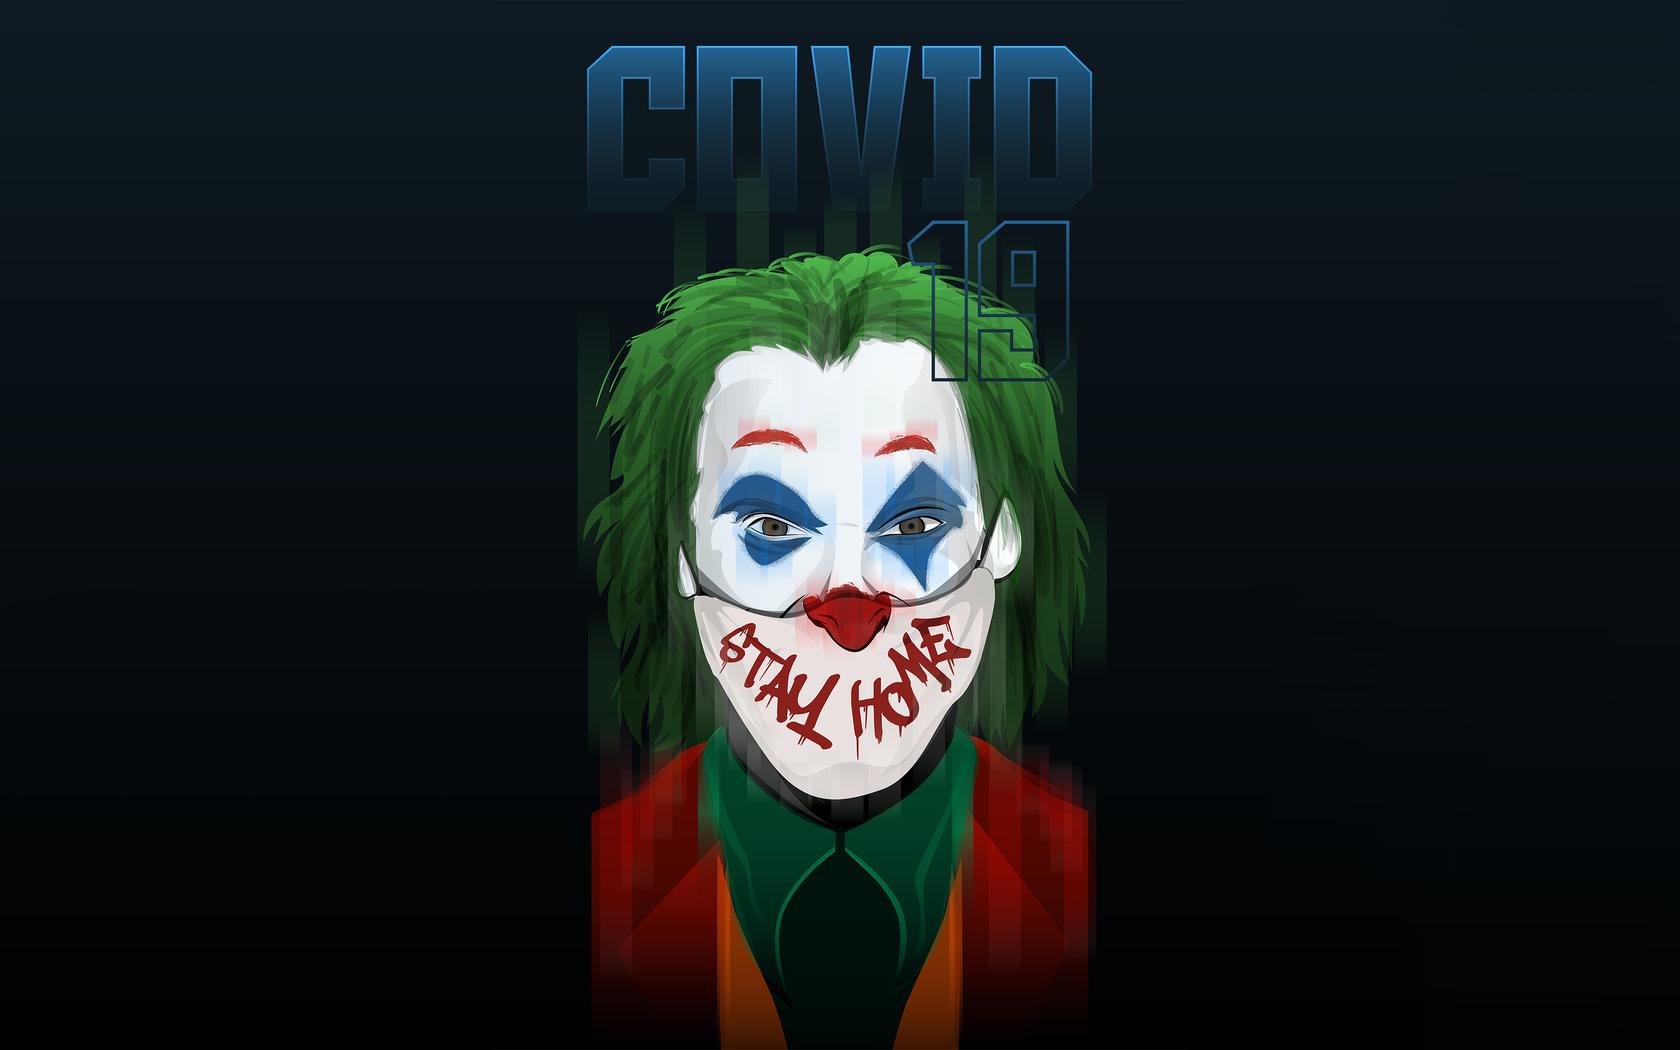 joker-mask-stay-home-4k-xf.jpg